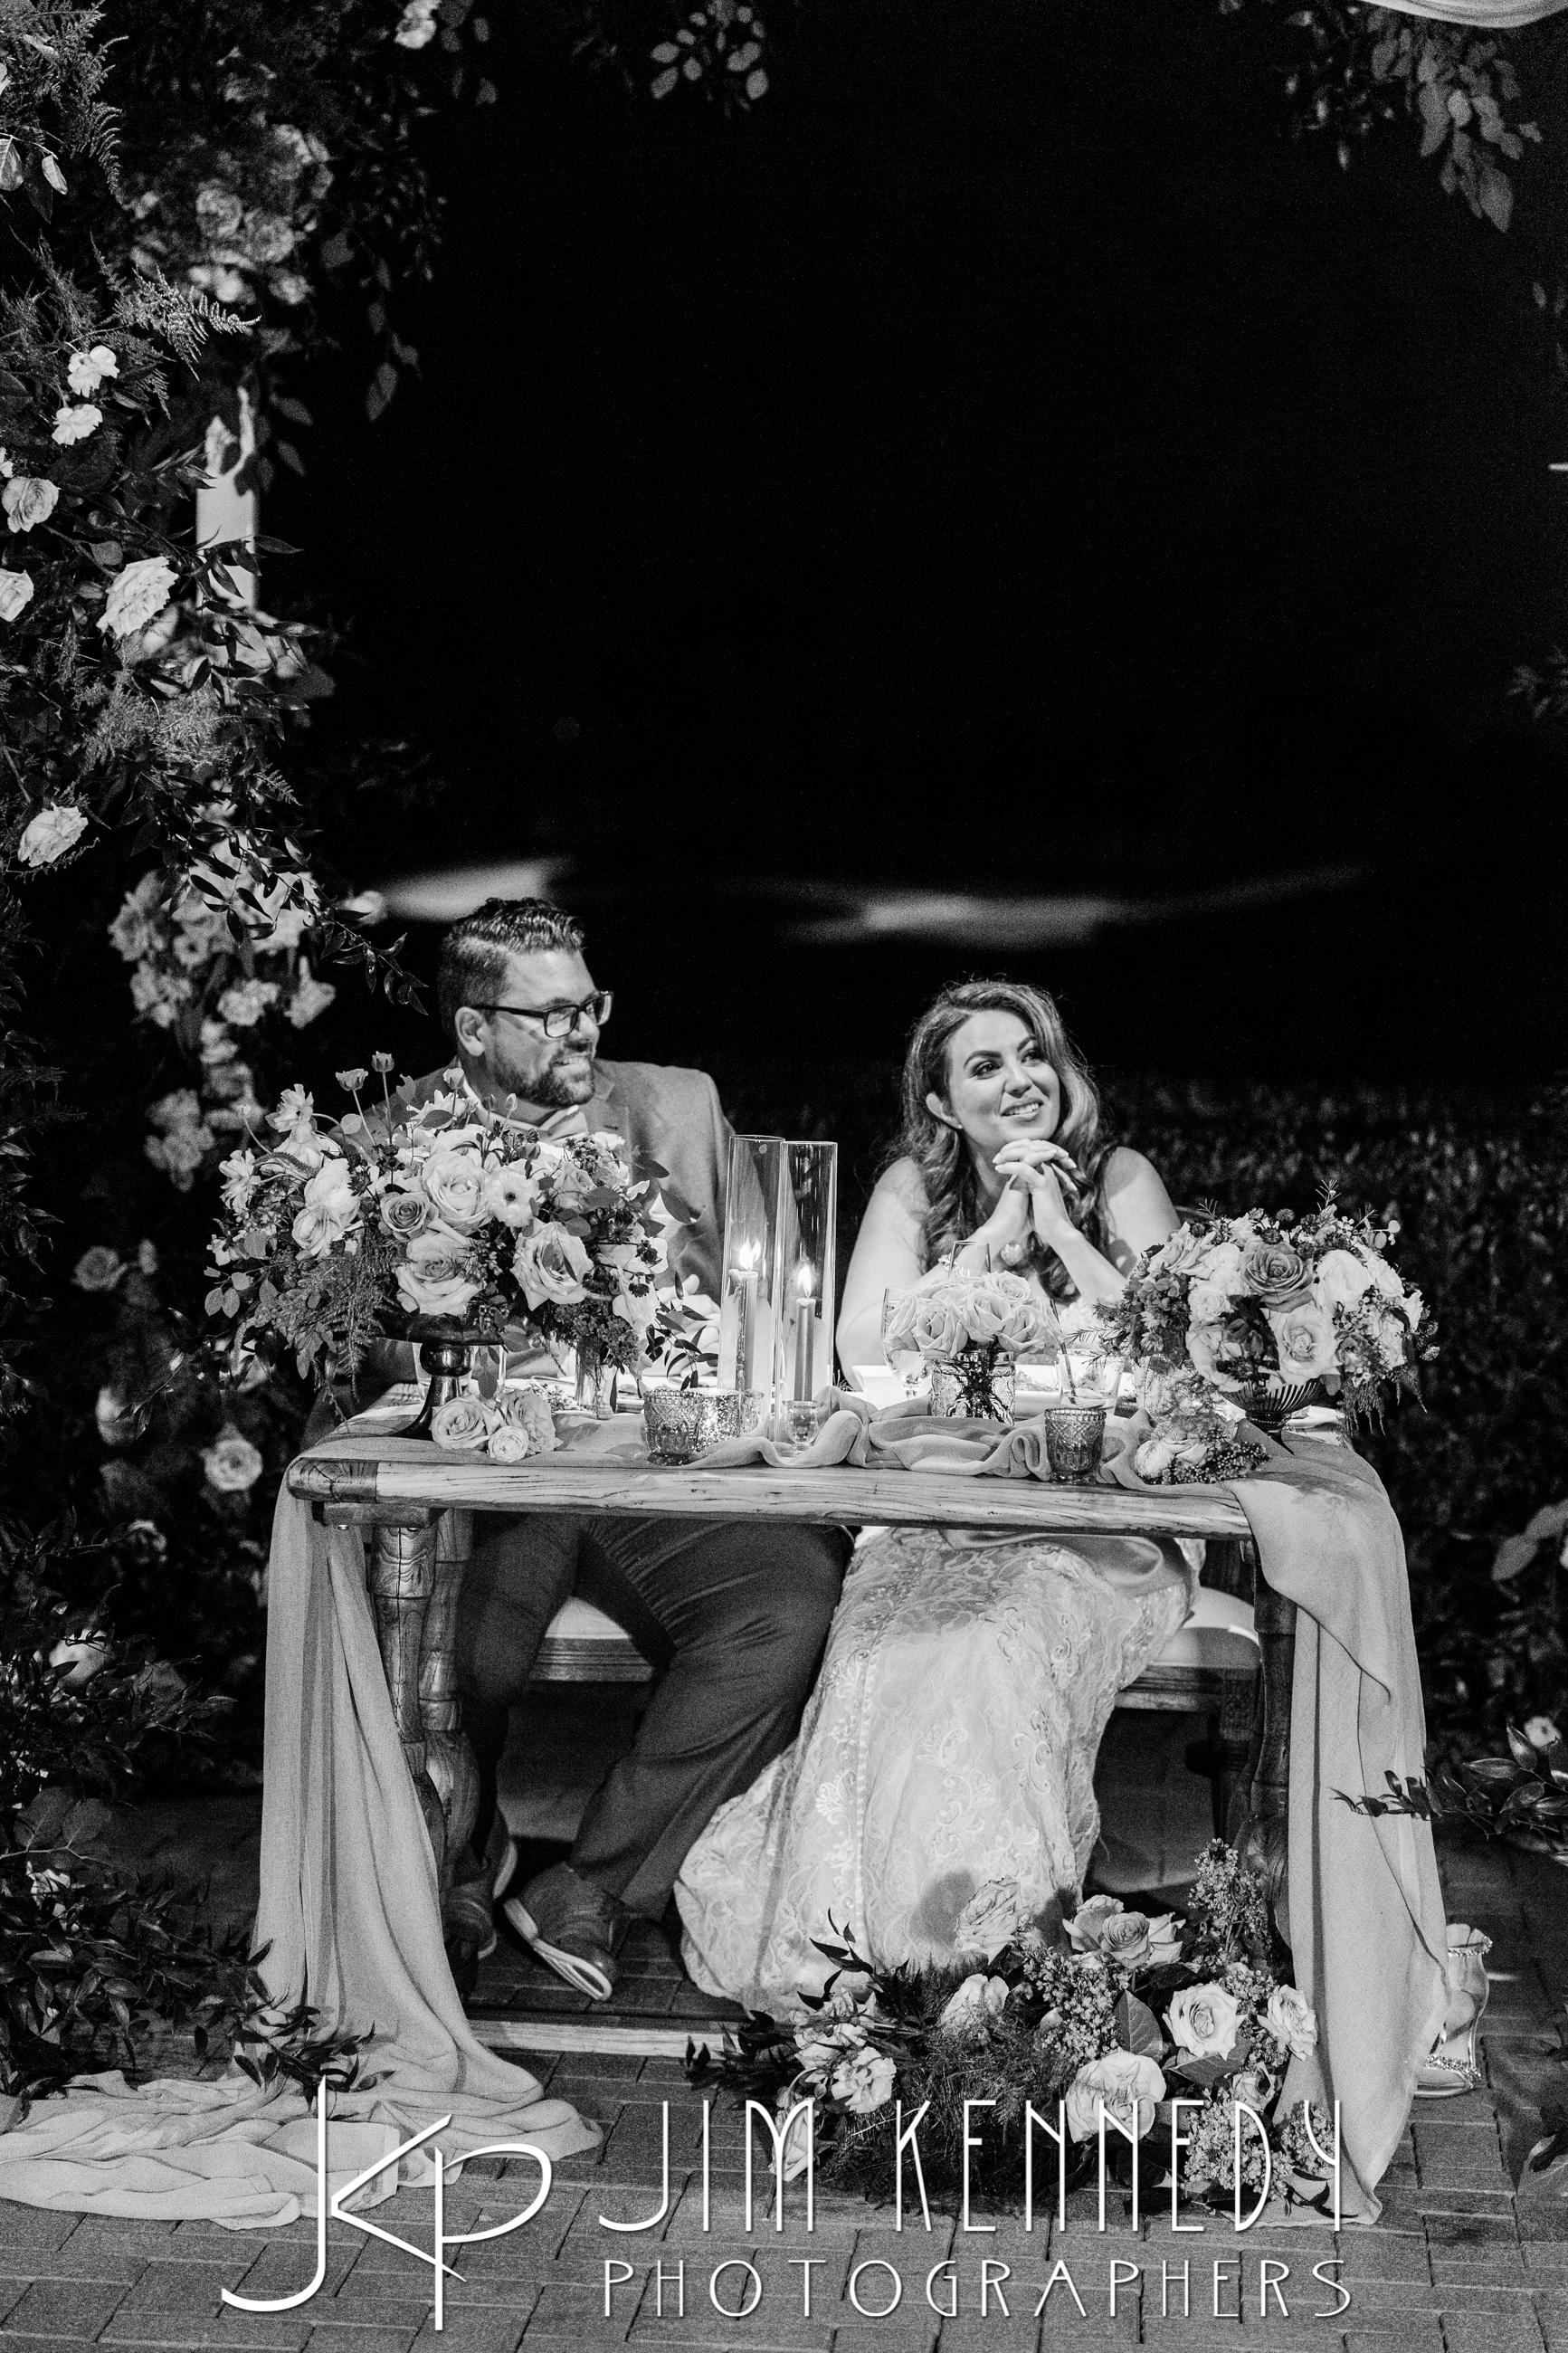 pelican-hill-wedding-jim-kenedy-photographers_0229.JPG